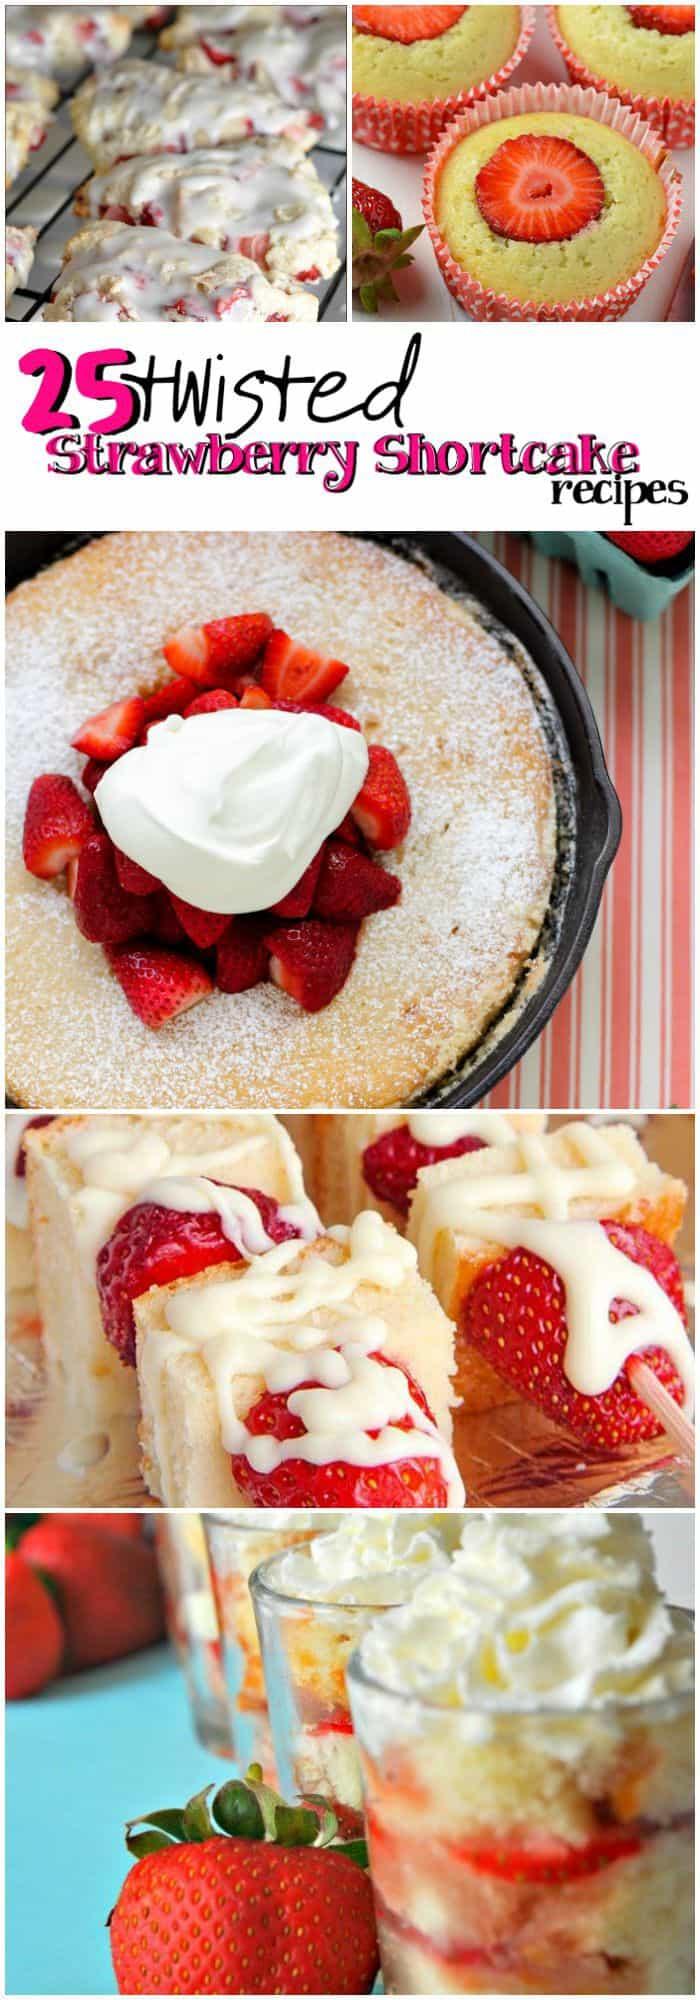 So many strawberry shortcake recipes -- so little time